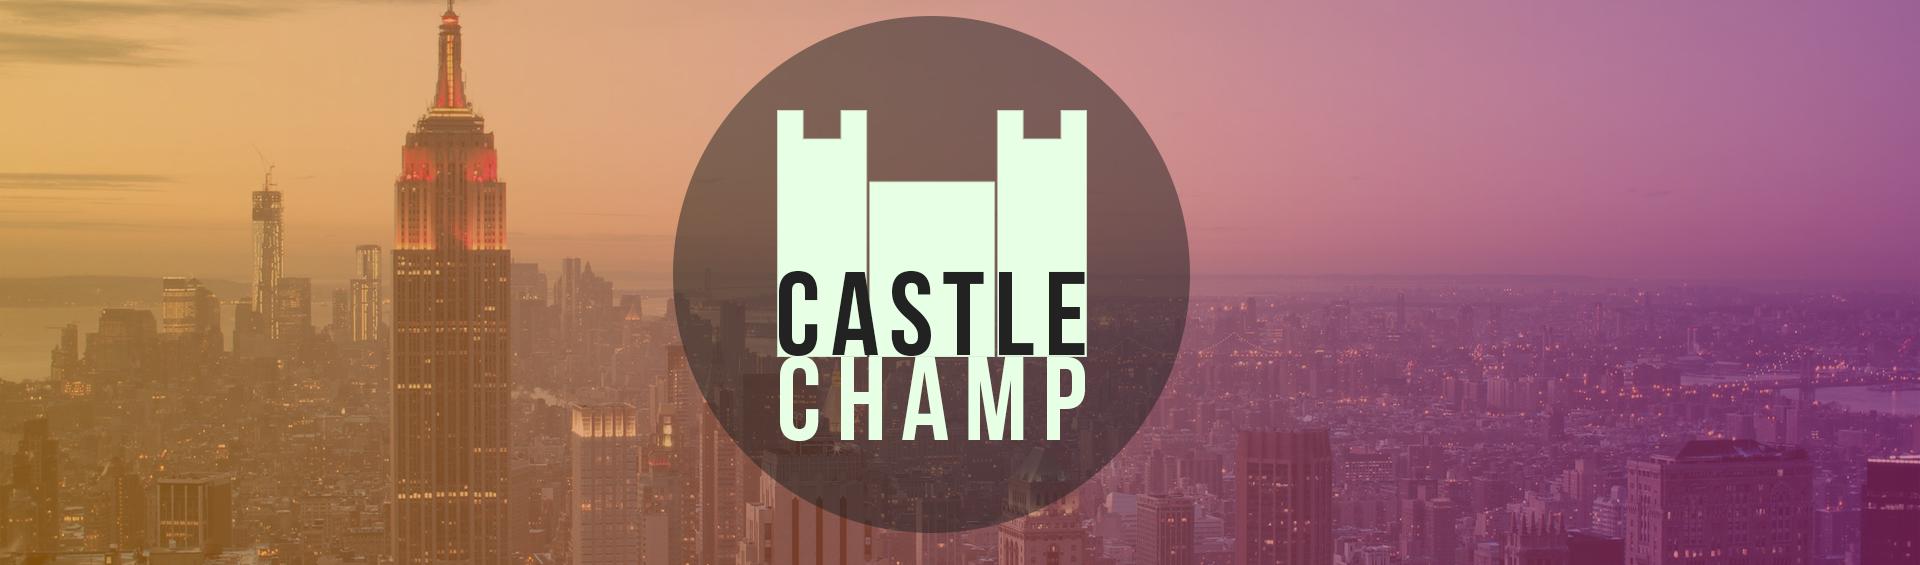 castlechamp